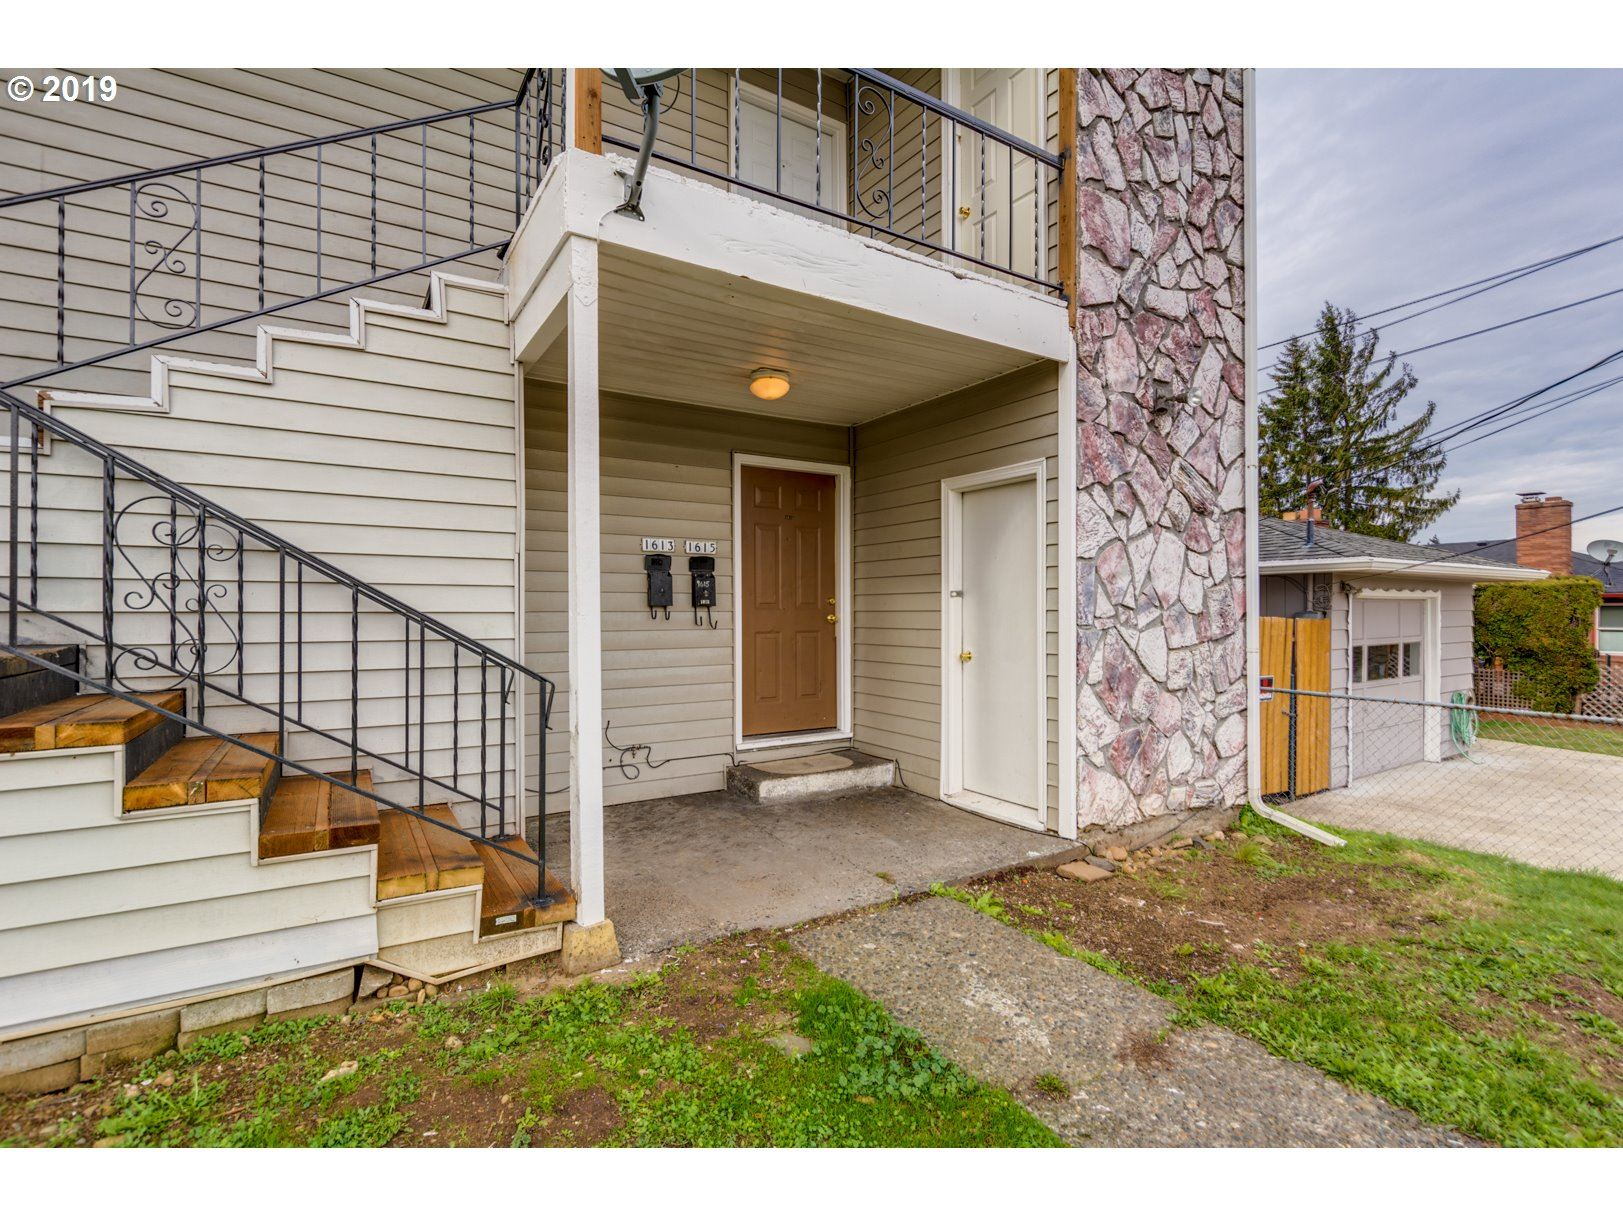 1613 NE 81ST AVE, Portland, OR 97213 - MLS#: 19379096